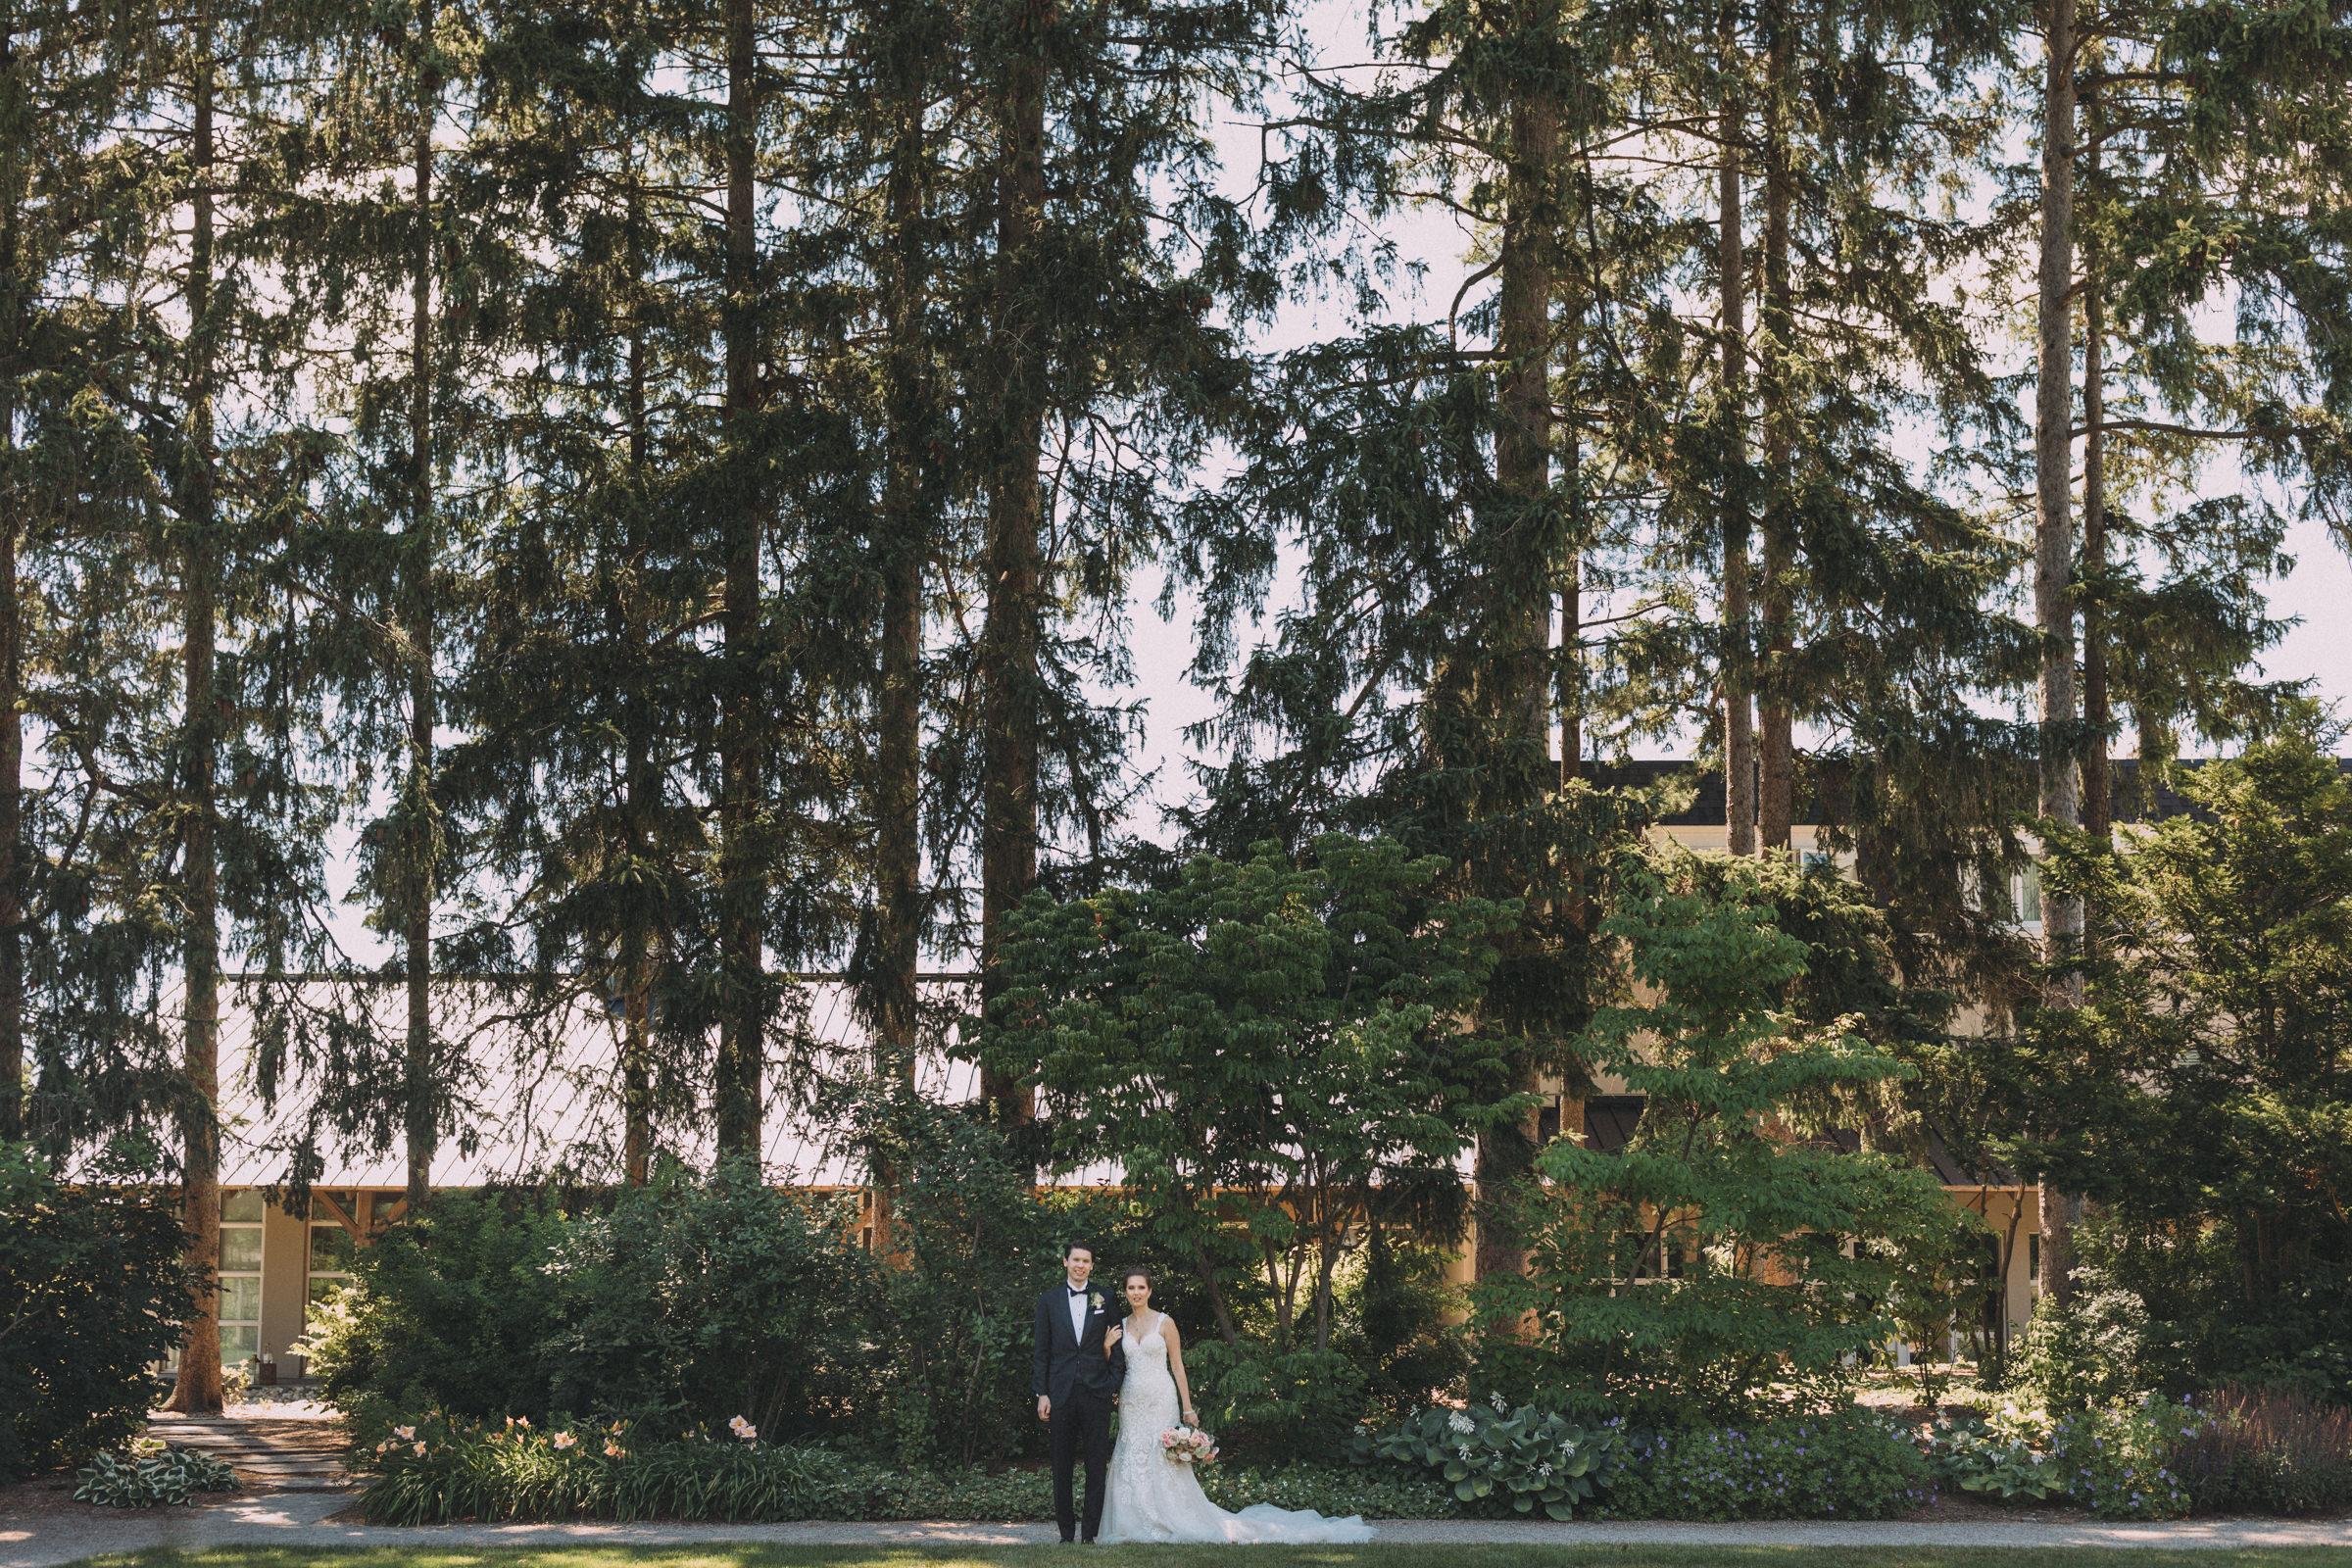 Langdon-Hall-wedding-photography-Cambridge-by-Sam-Wong-of-Visual-Cravings_Sarah-Ryan_19.jpg